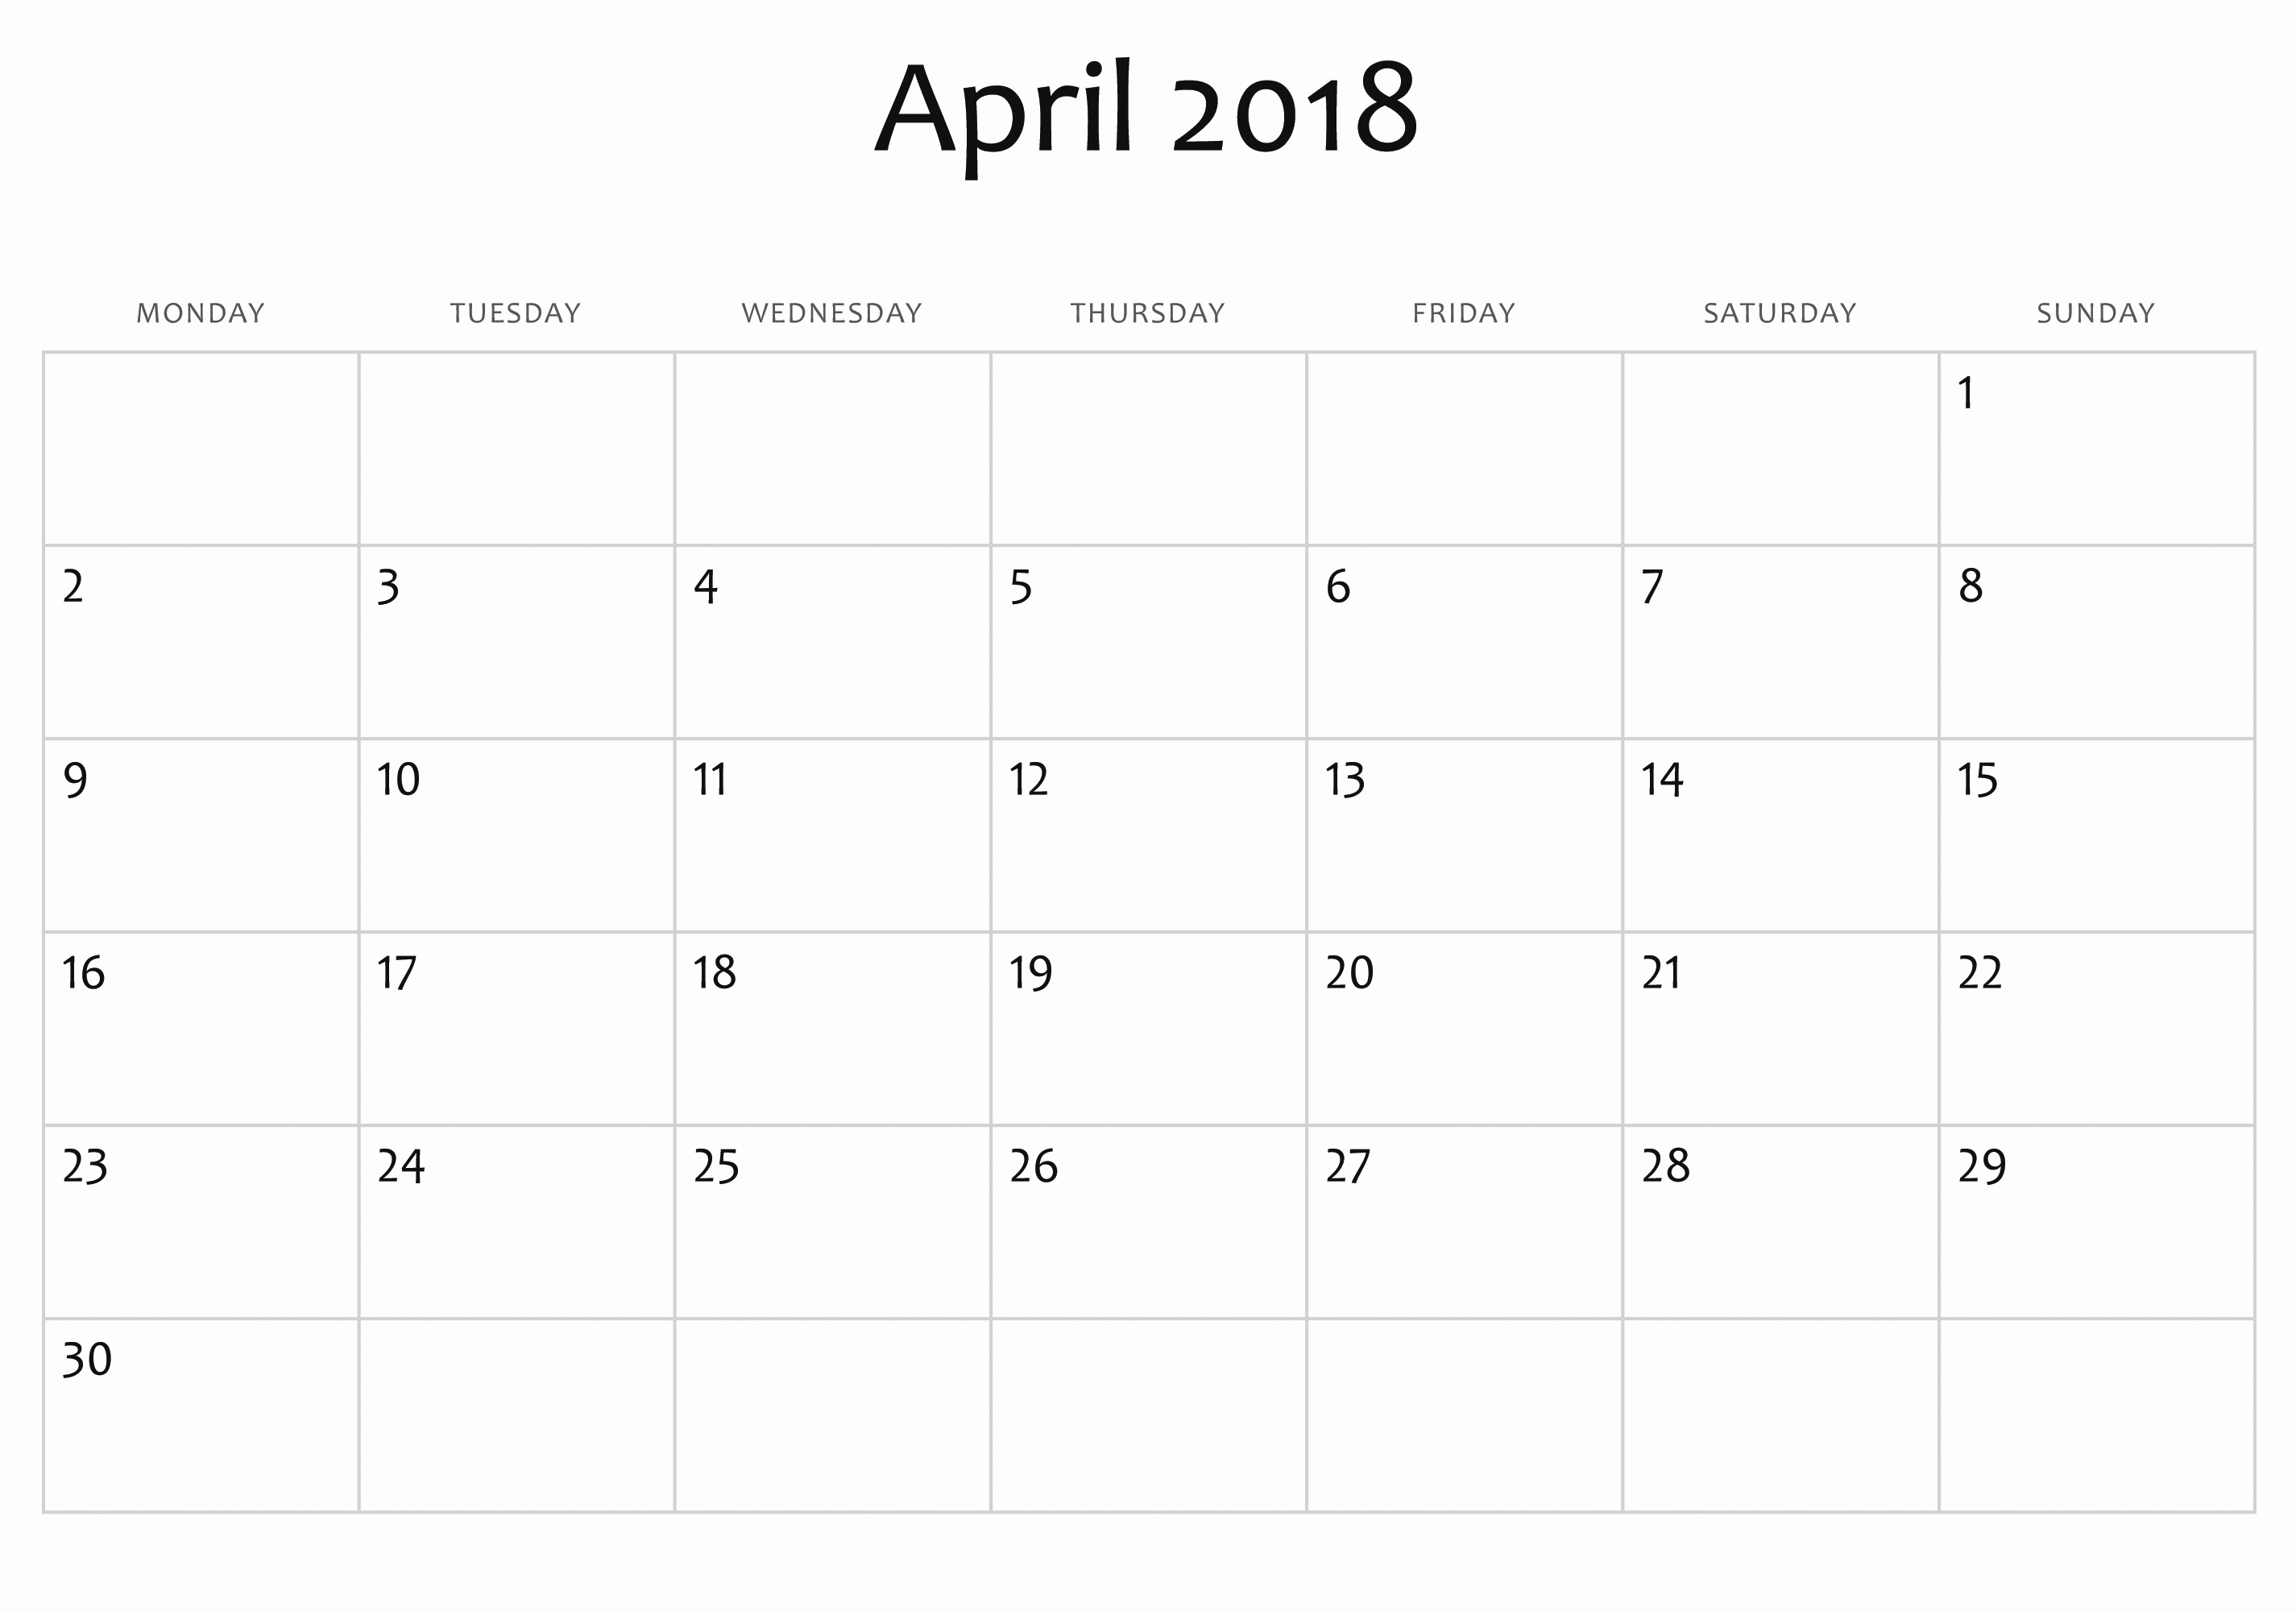 Blank May 2018 Calendar Printable Fresh Blank April 2018 Calendar Template Printable